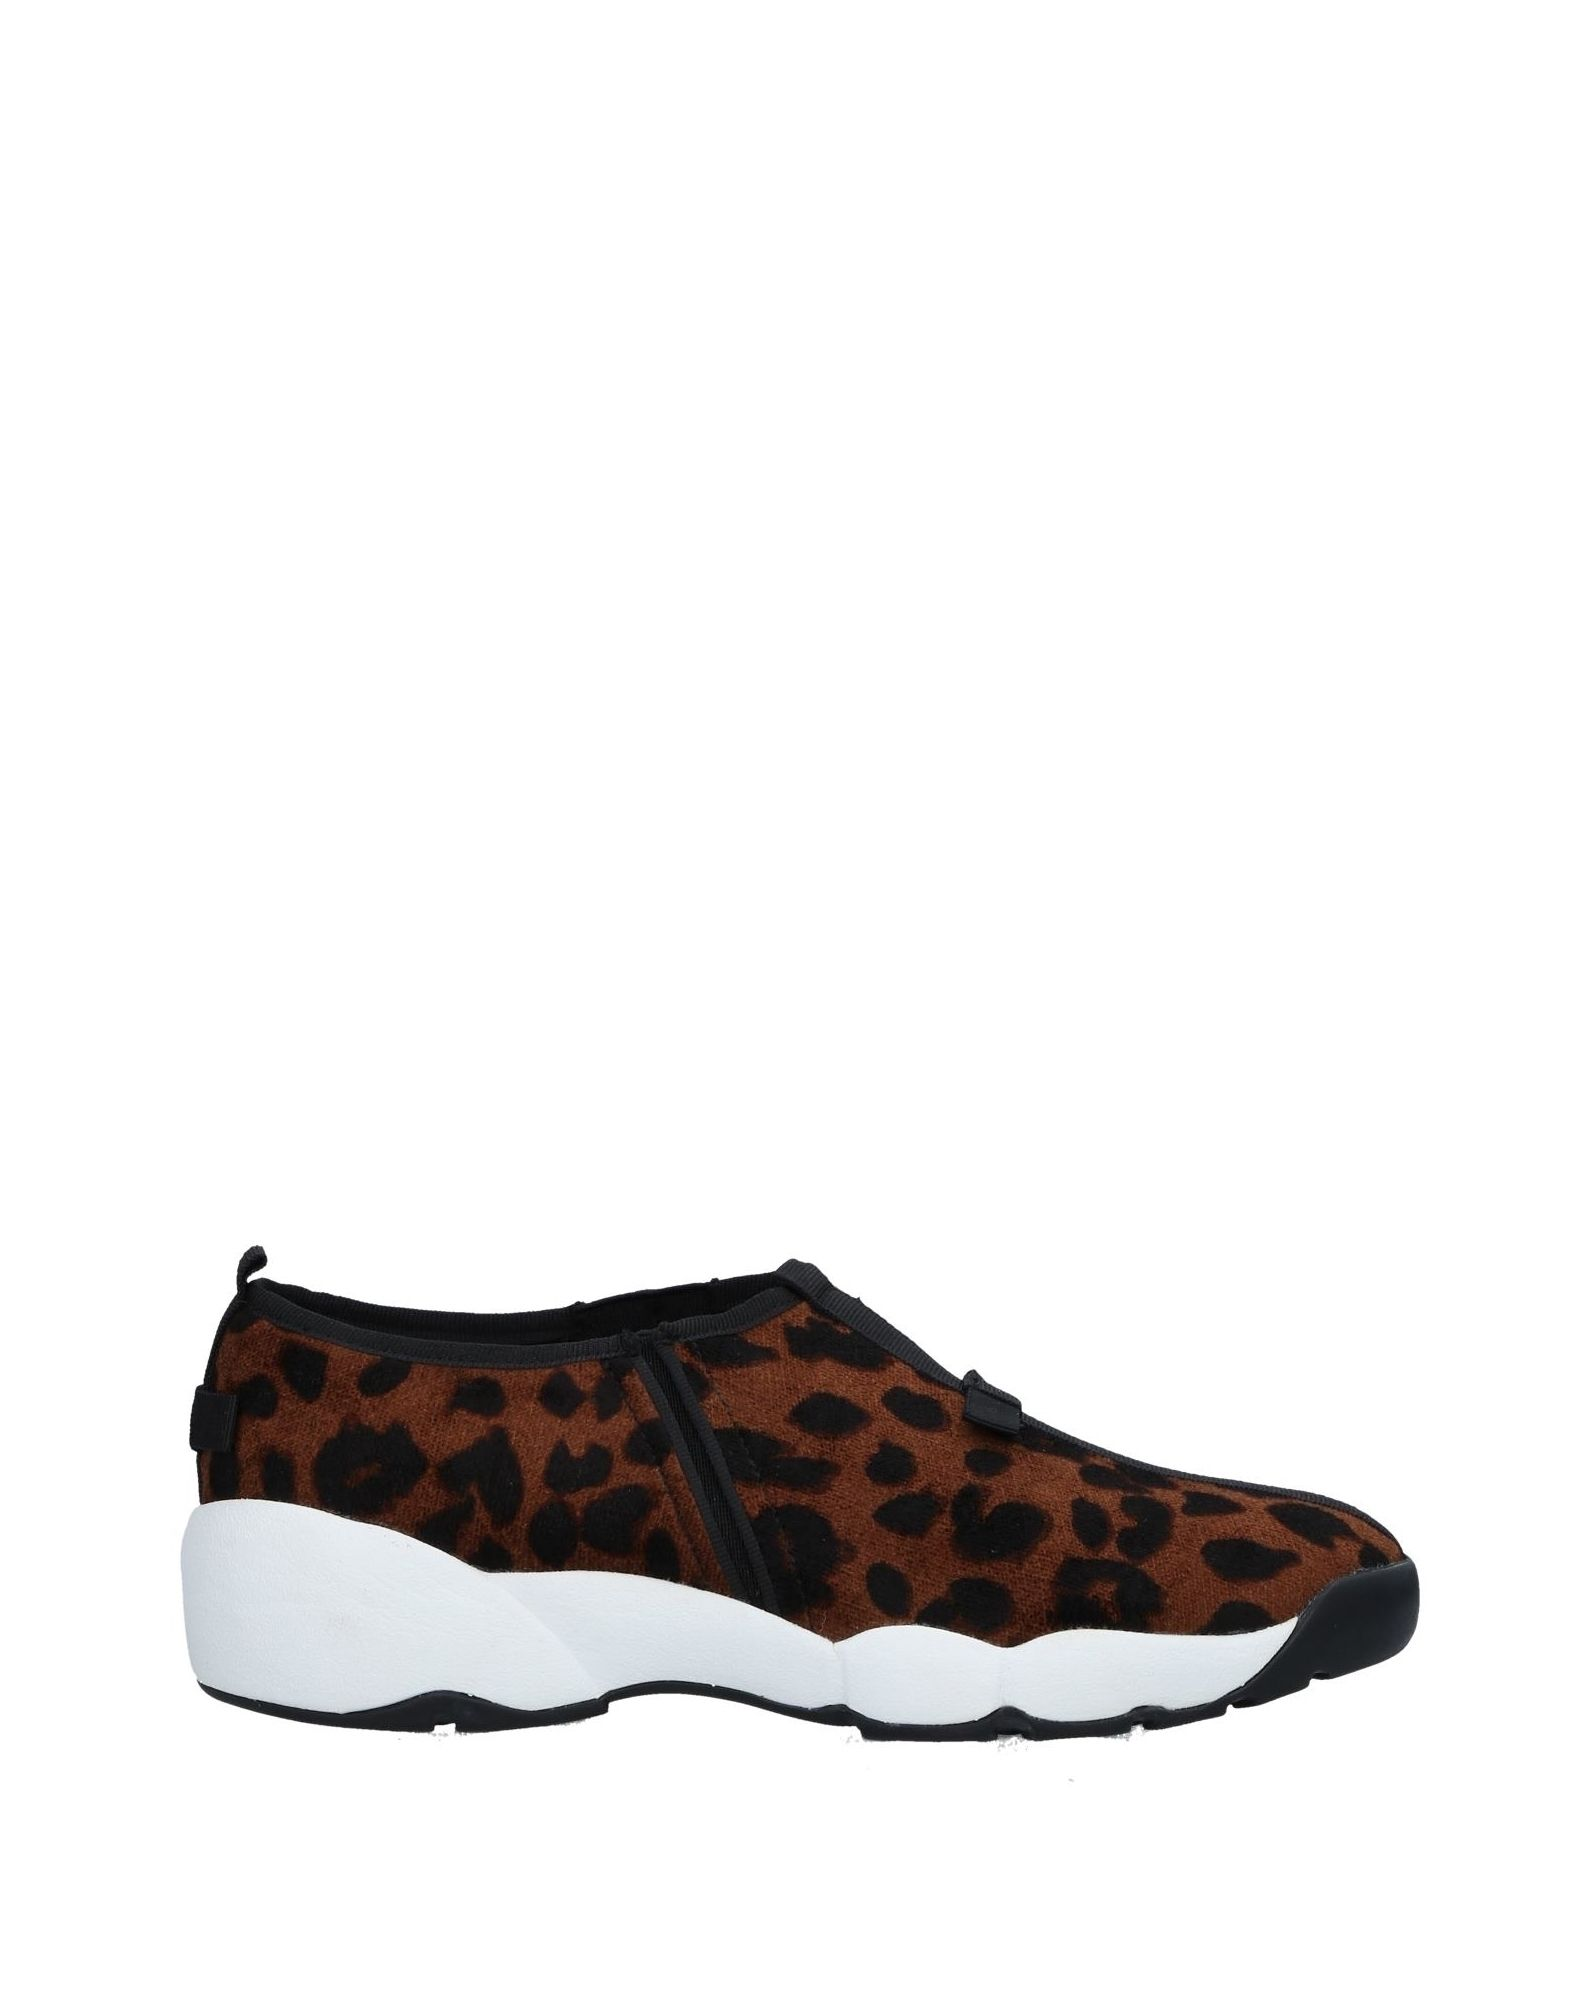 So•Queen Sneakers Damen  11527955HI Gute Qualität beliebte Schuhe